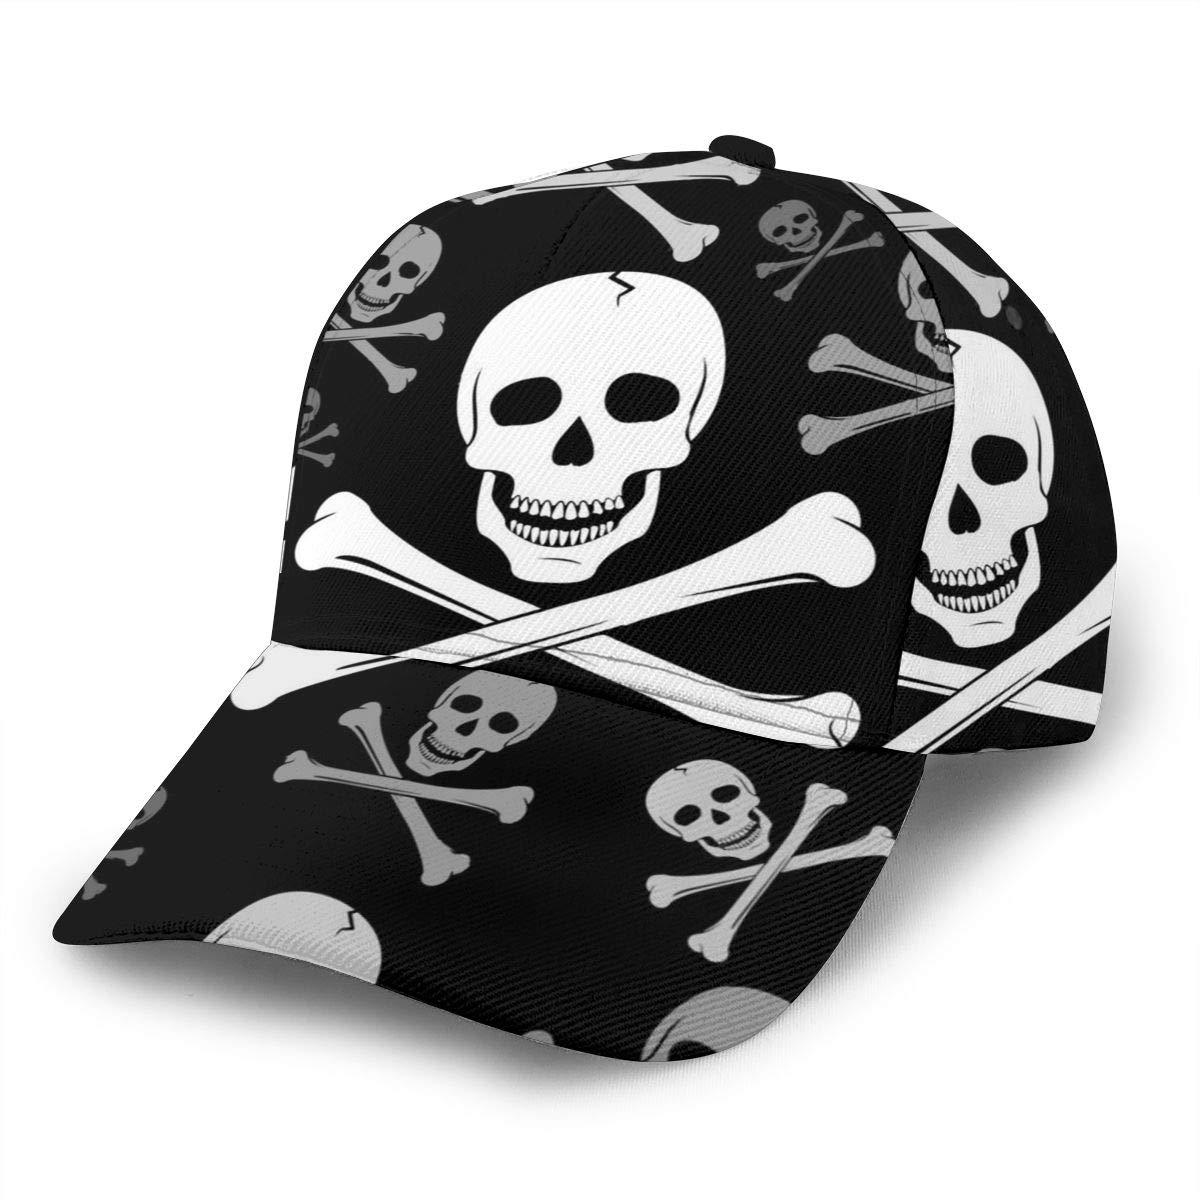 Kunming~ White Skull Girl Washed Denim Cotton Baseball Cap Sport Outdoor Adjustable Hats